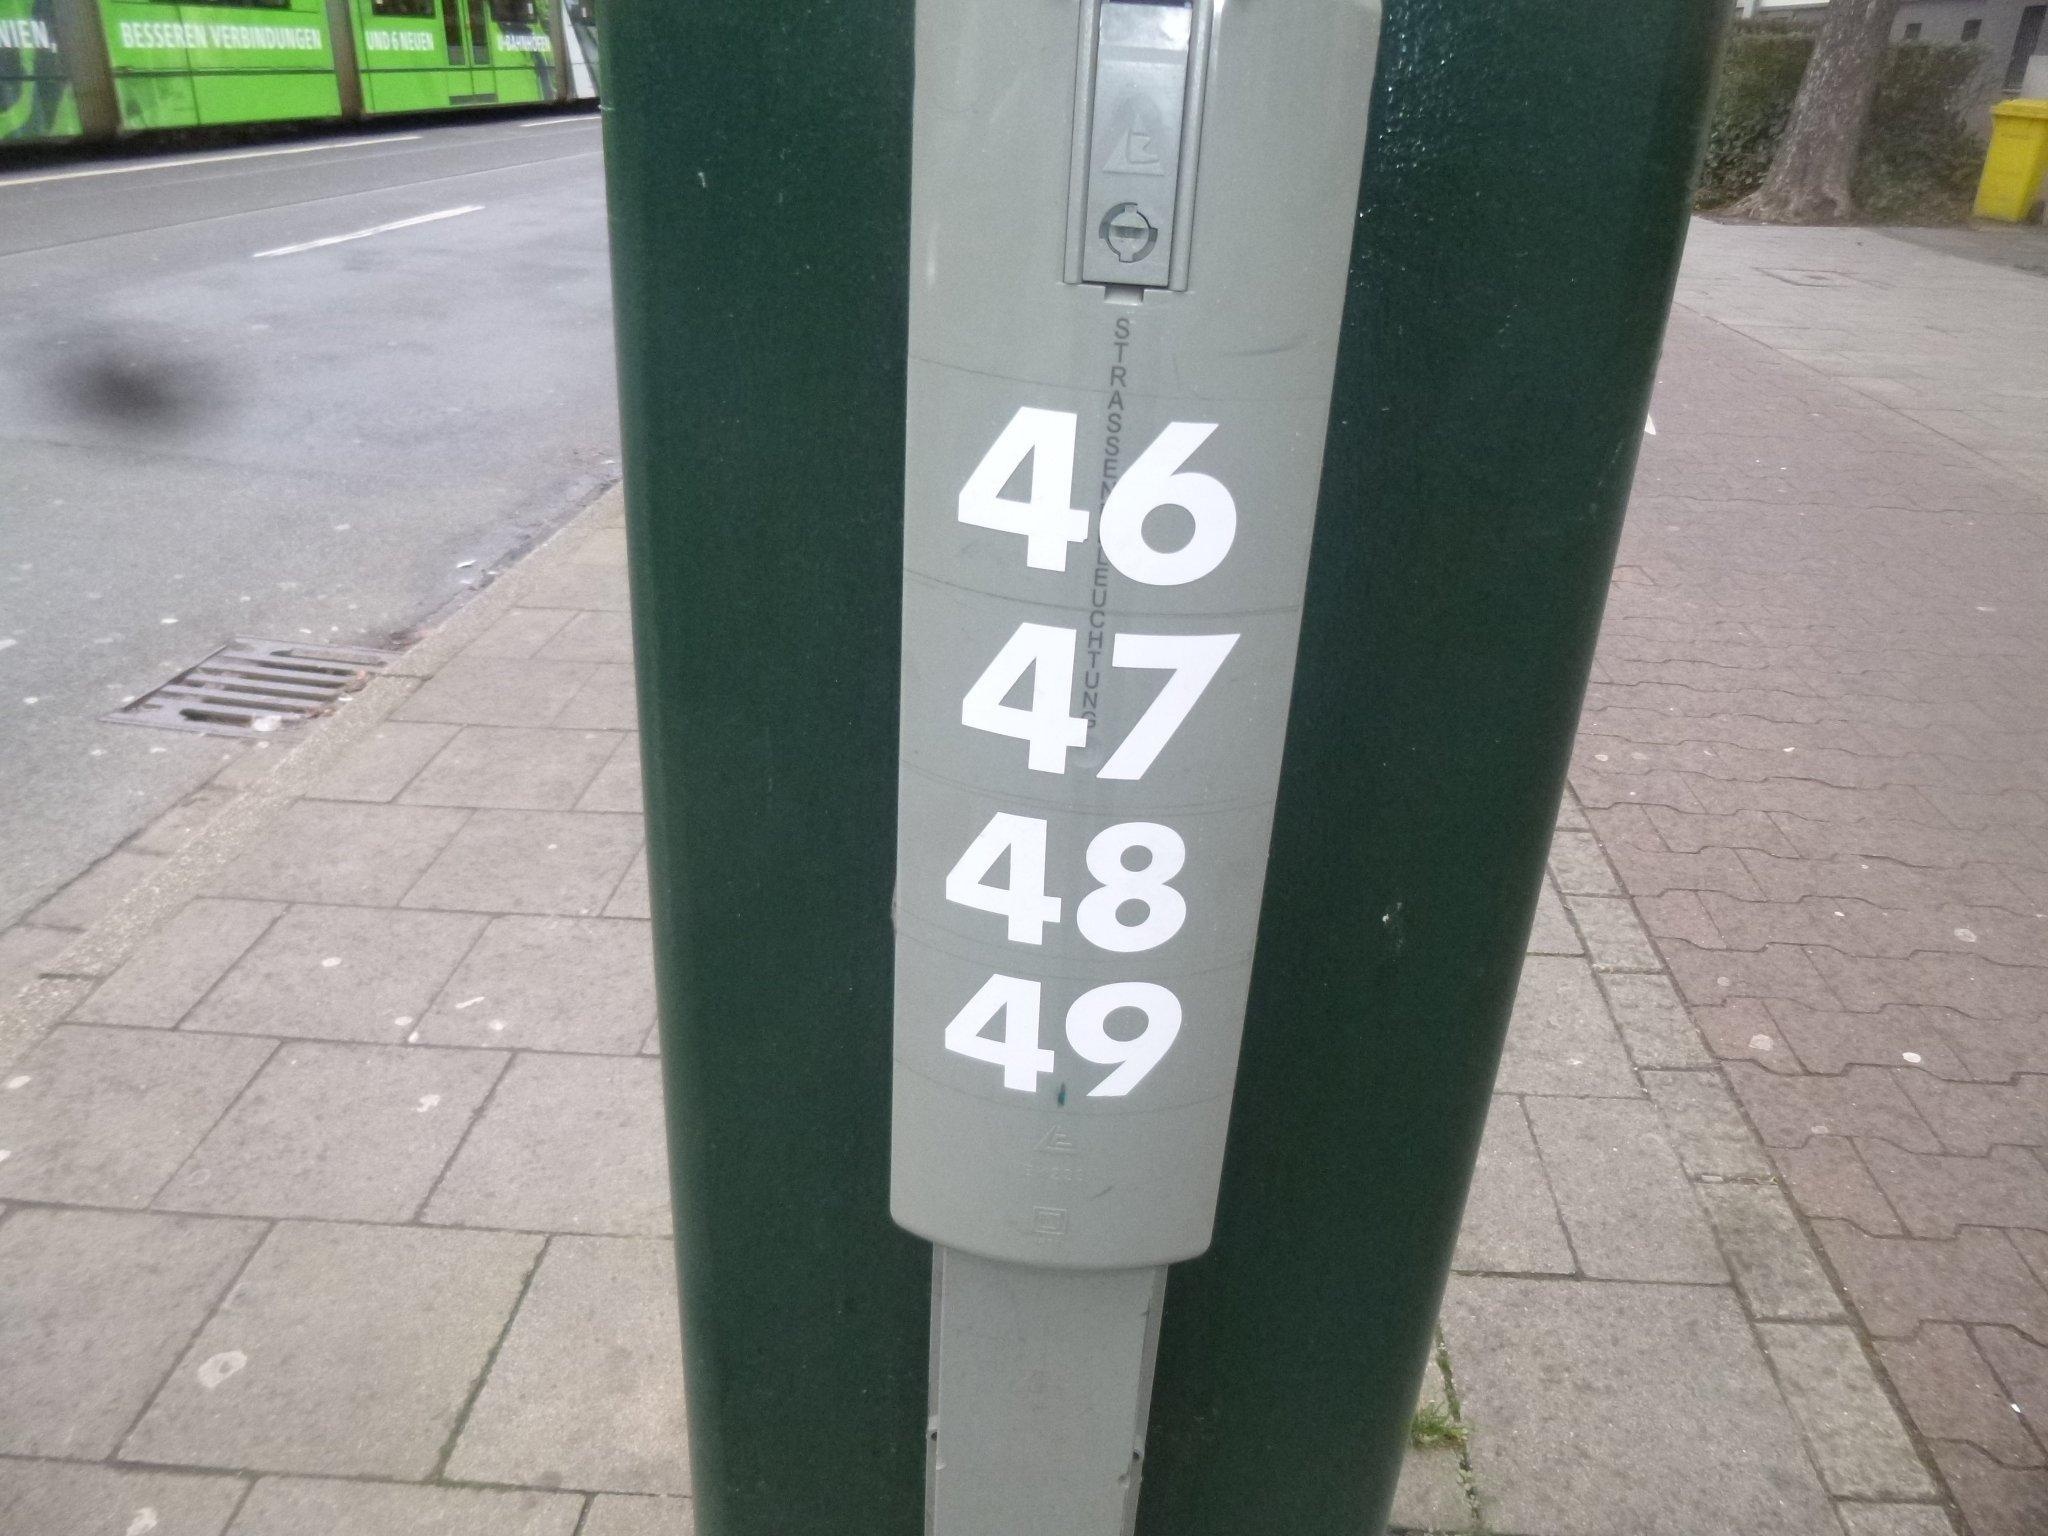 46 - 47 - 48 - 49